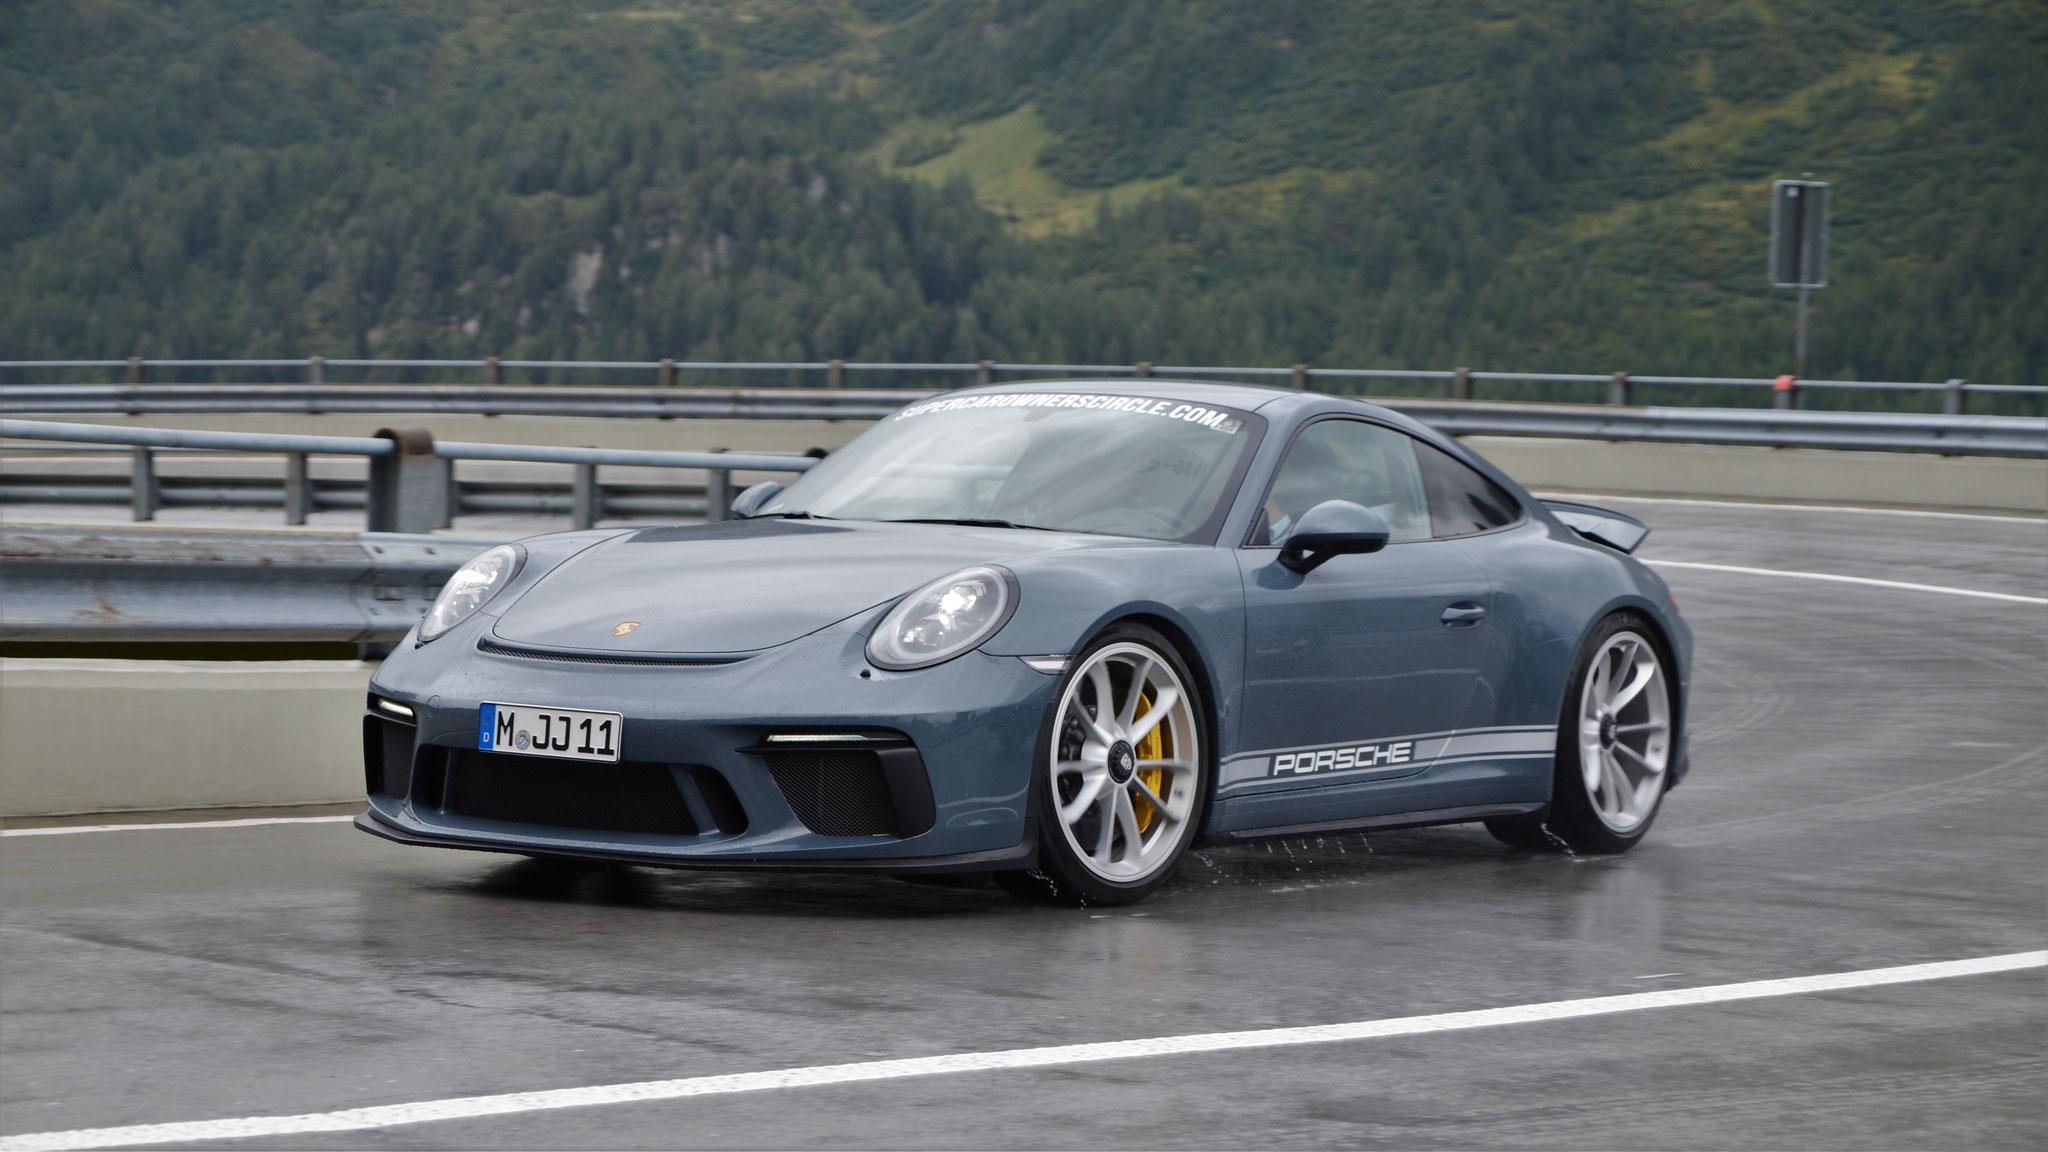 Porsche 991 GT3 Touring Package - M-JJ-11